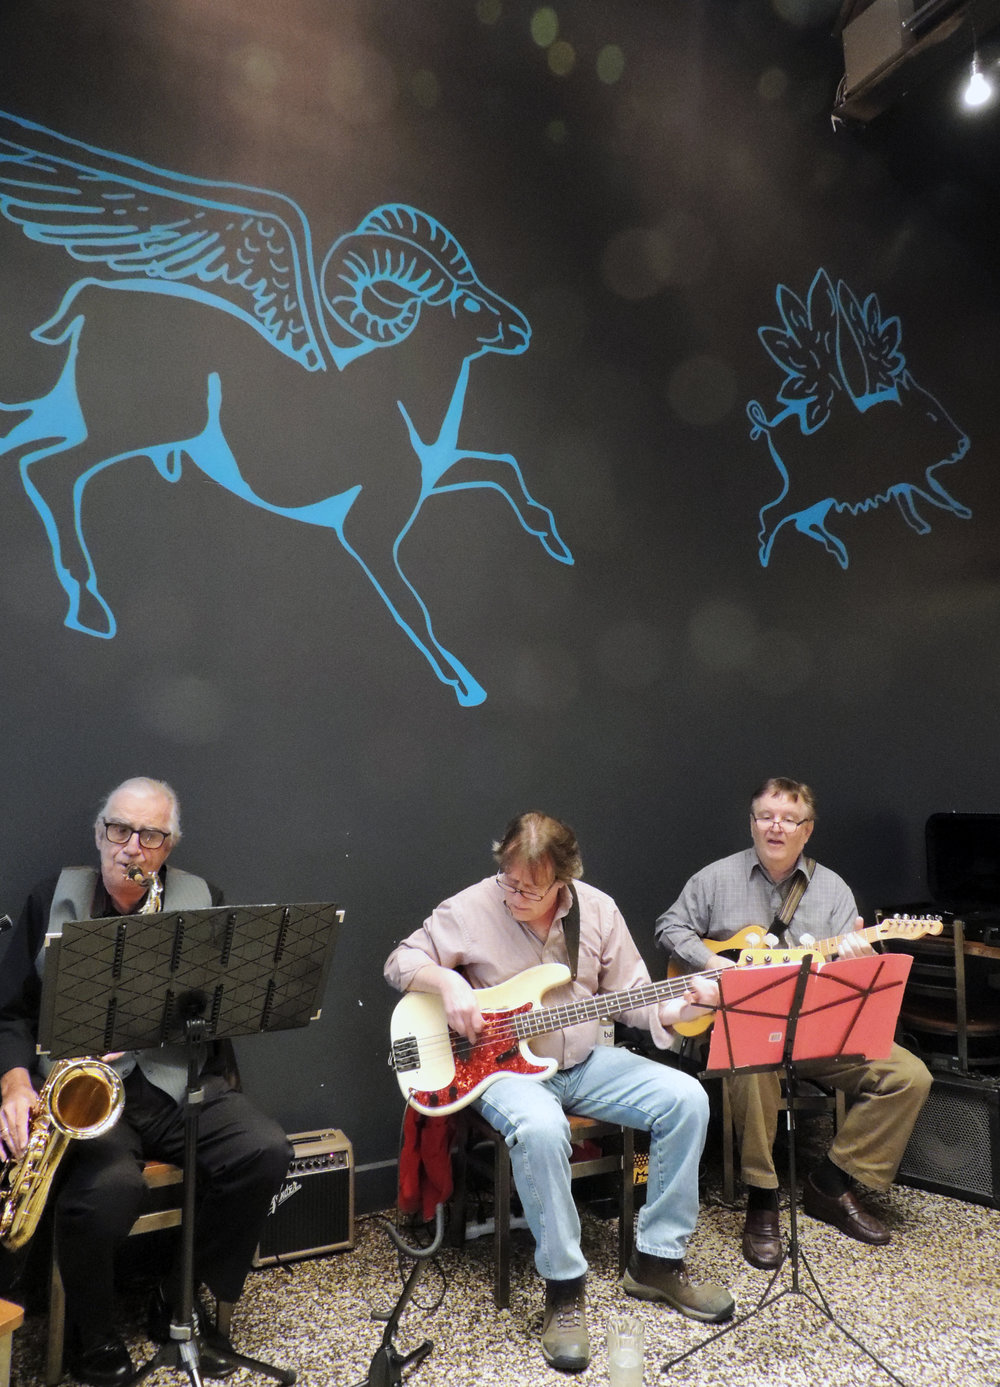 The_Naughty_Greek_Live_Music_Thursdays_Jazz_Standards_Trio.jpg